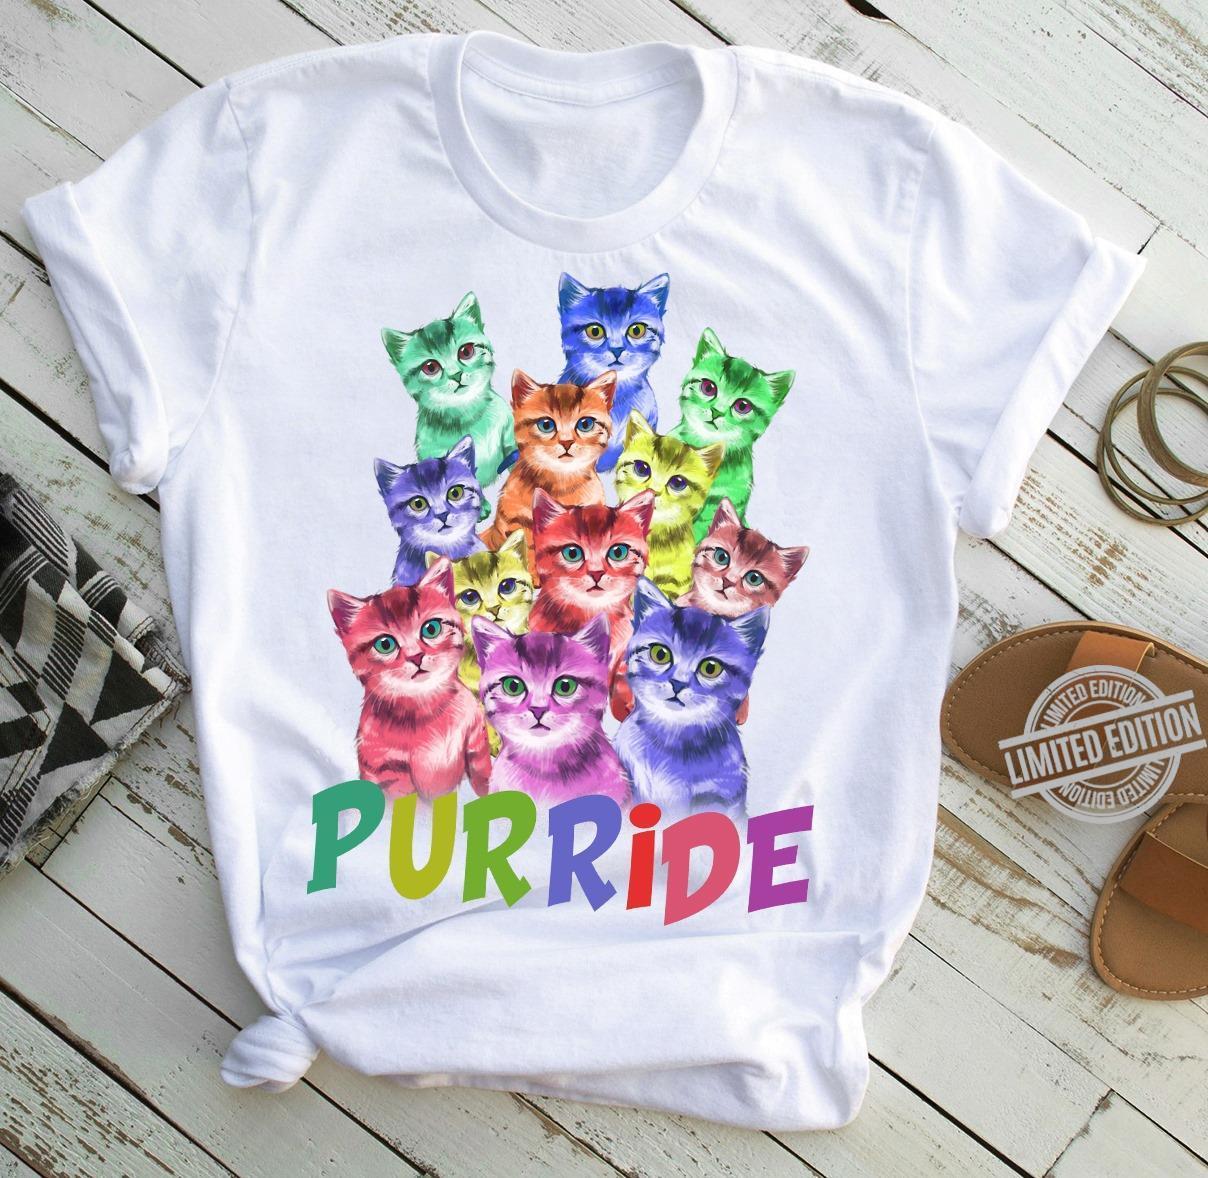 Purride Shirt